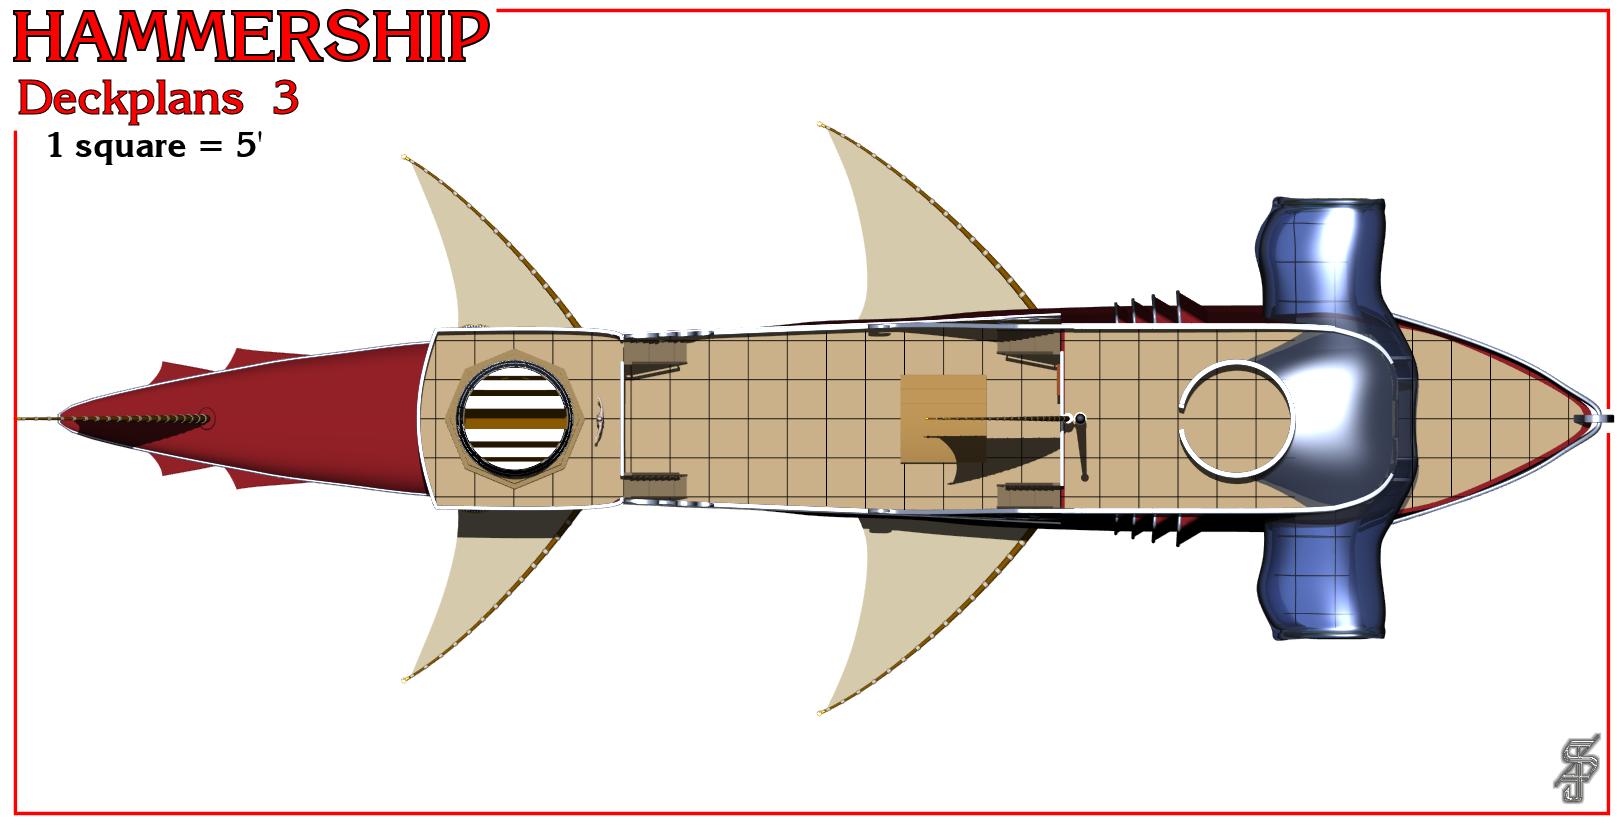 Hammership layout 3